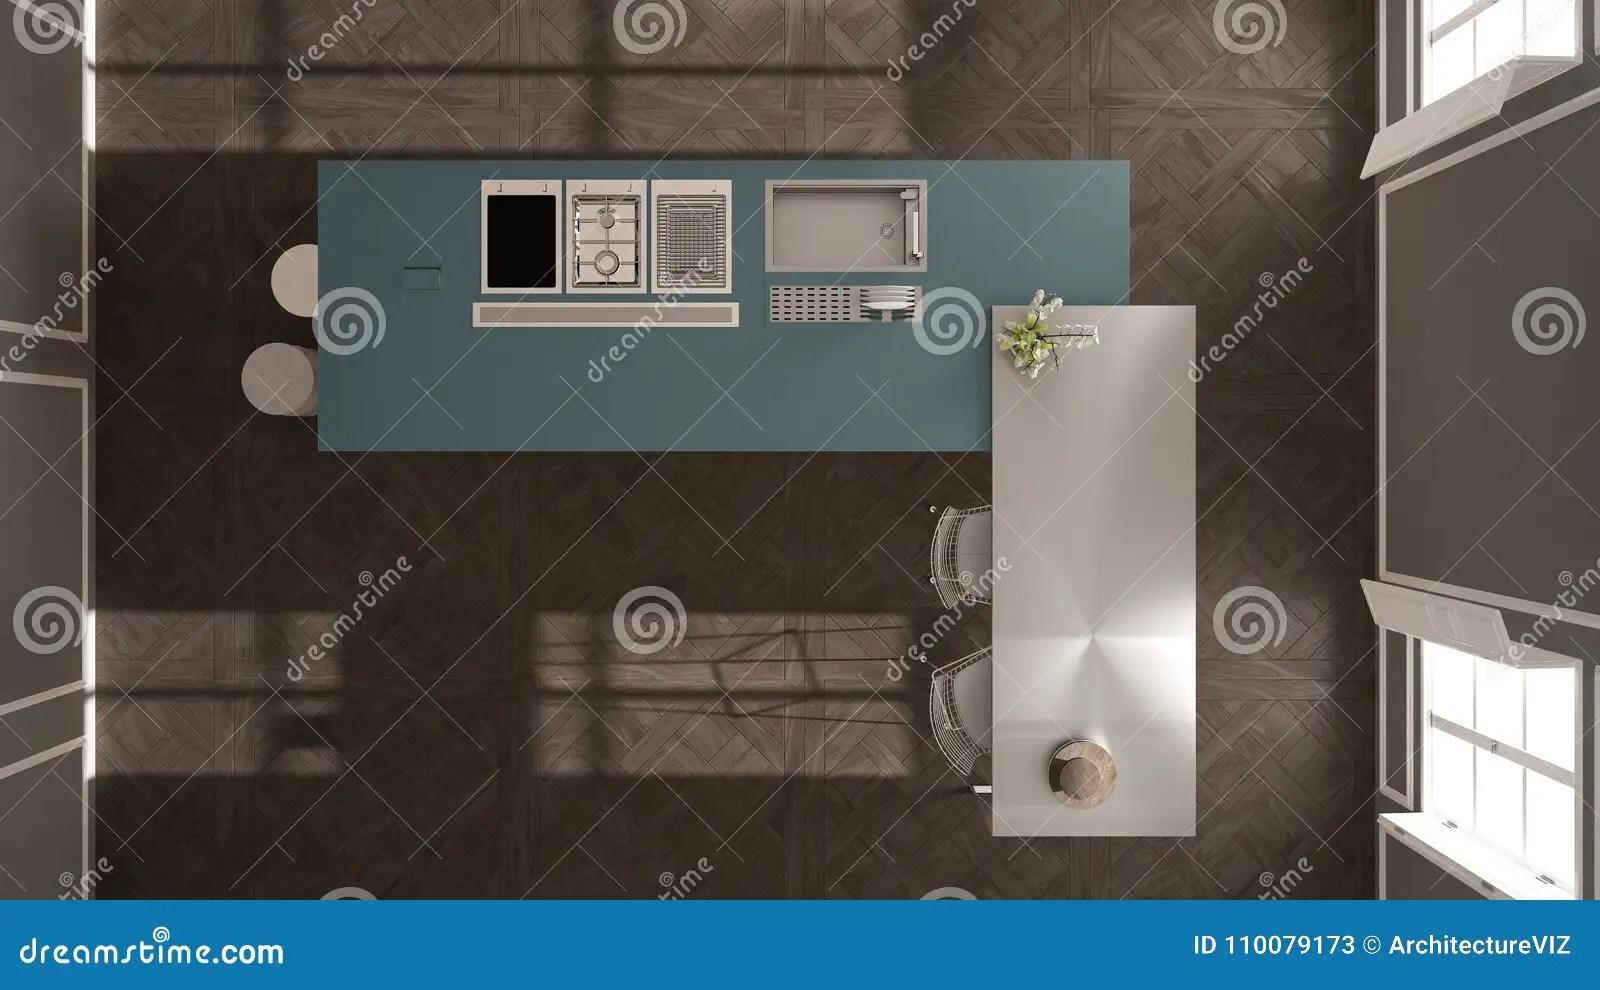 navy blue kitchen decor small island with chairs 经典内部的现代有凳子和两的大窗口厨房 海岛 顶视图 白色和蓝色海军 白色和蓝色海军建筑学室内设计